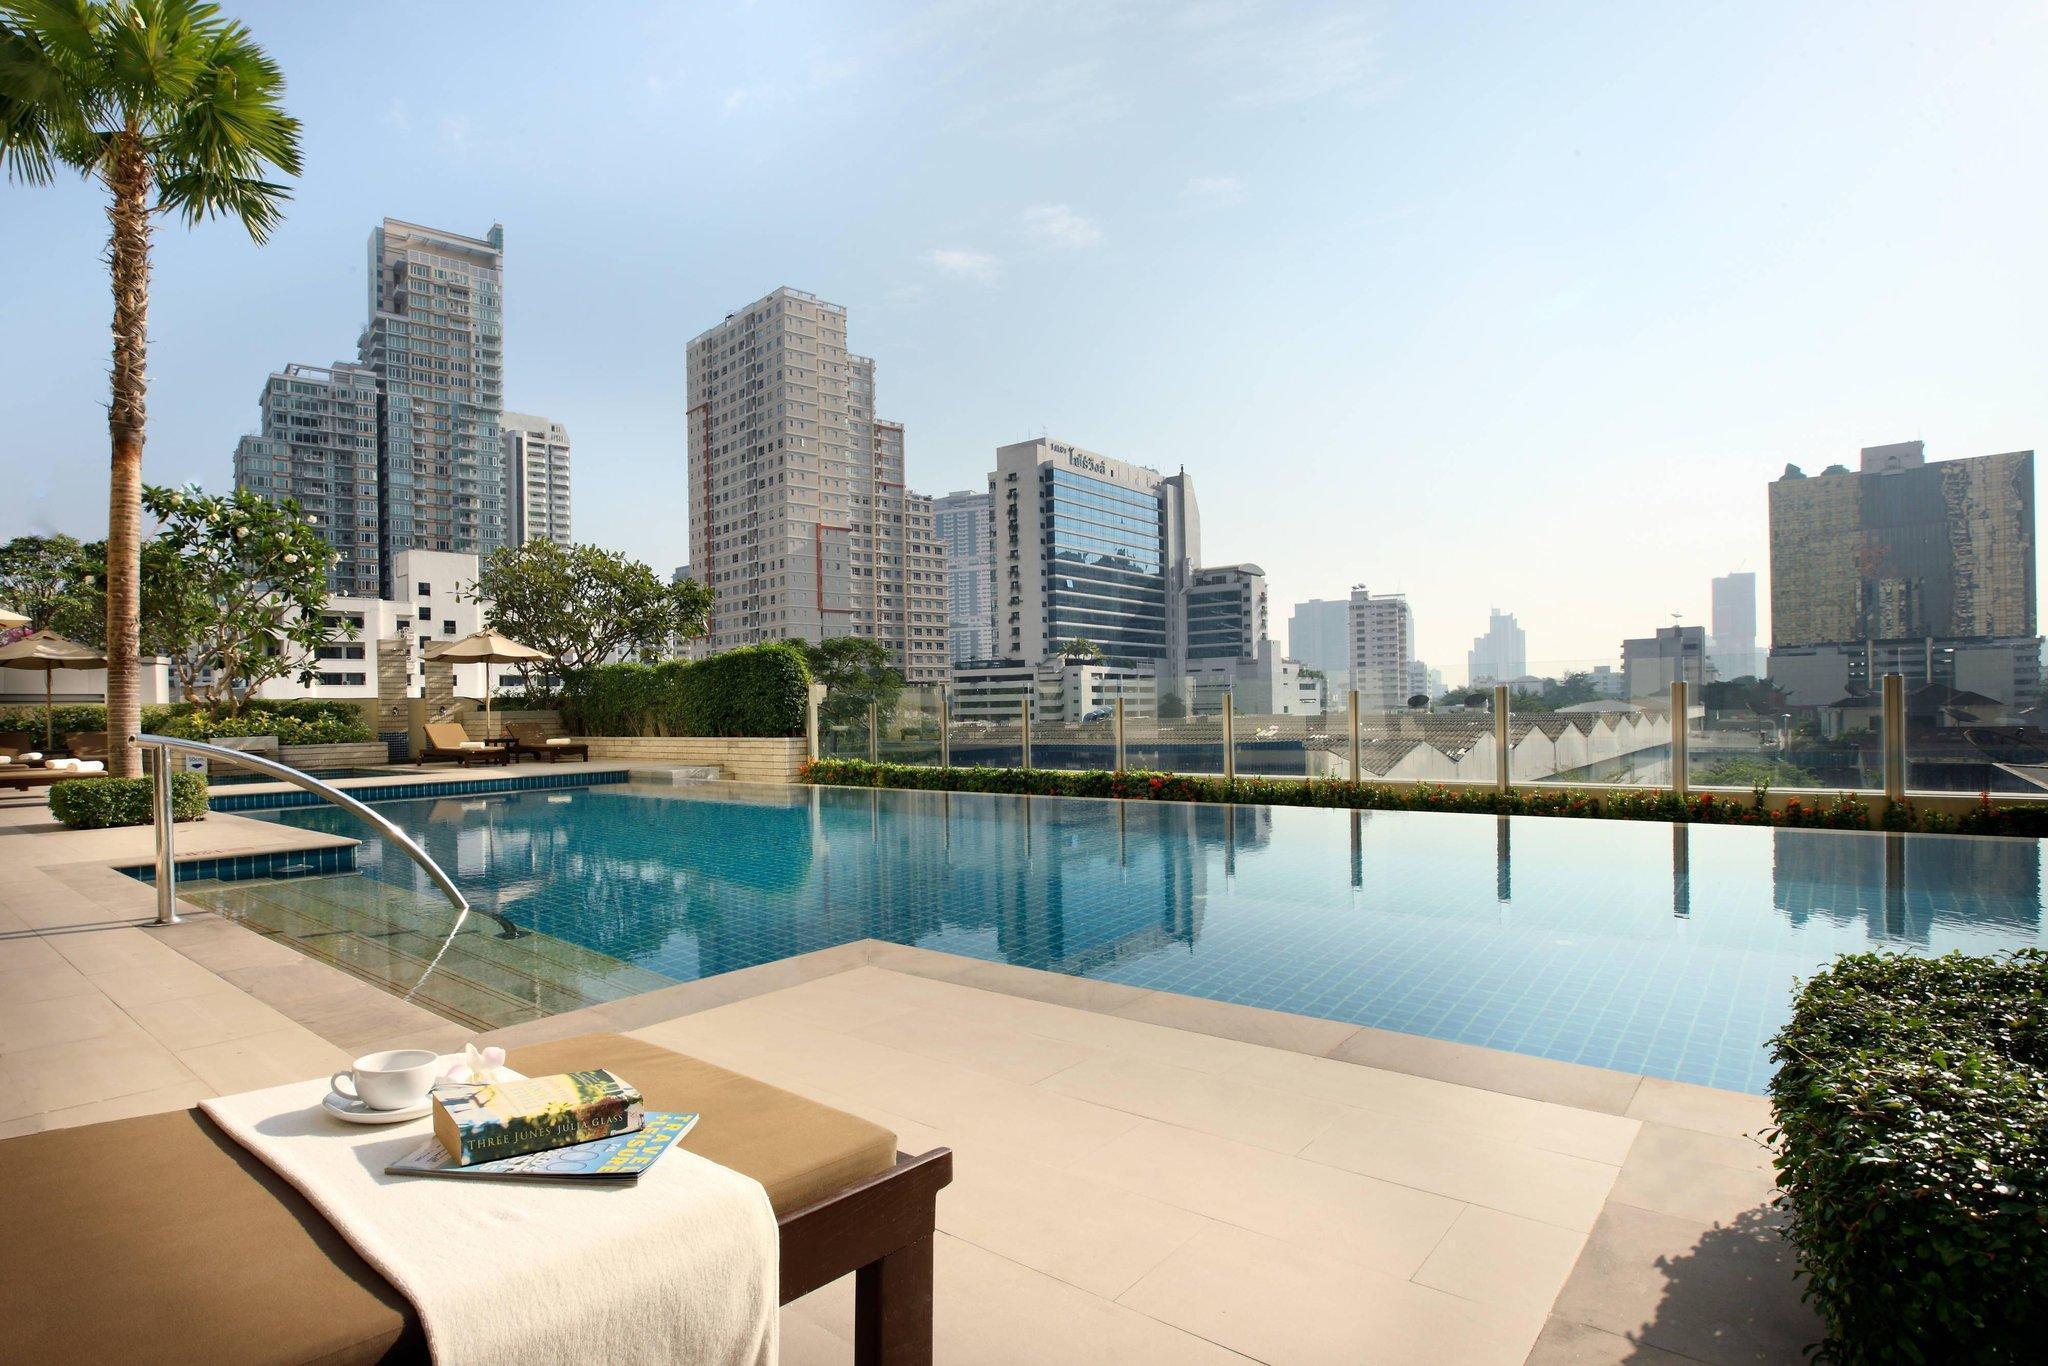 Sukhumvit Park, Bangkok - Marriott Executive Apartments สุขุมวิทพาร์ค กรุงเทพฯ - แมริออท เอ็กเซกคิวทีฟ อพาร์ตเมนต์